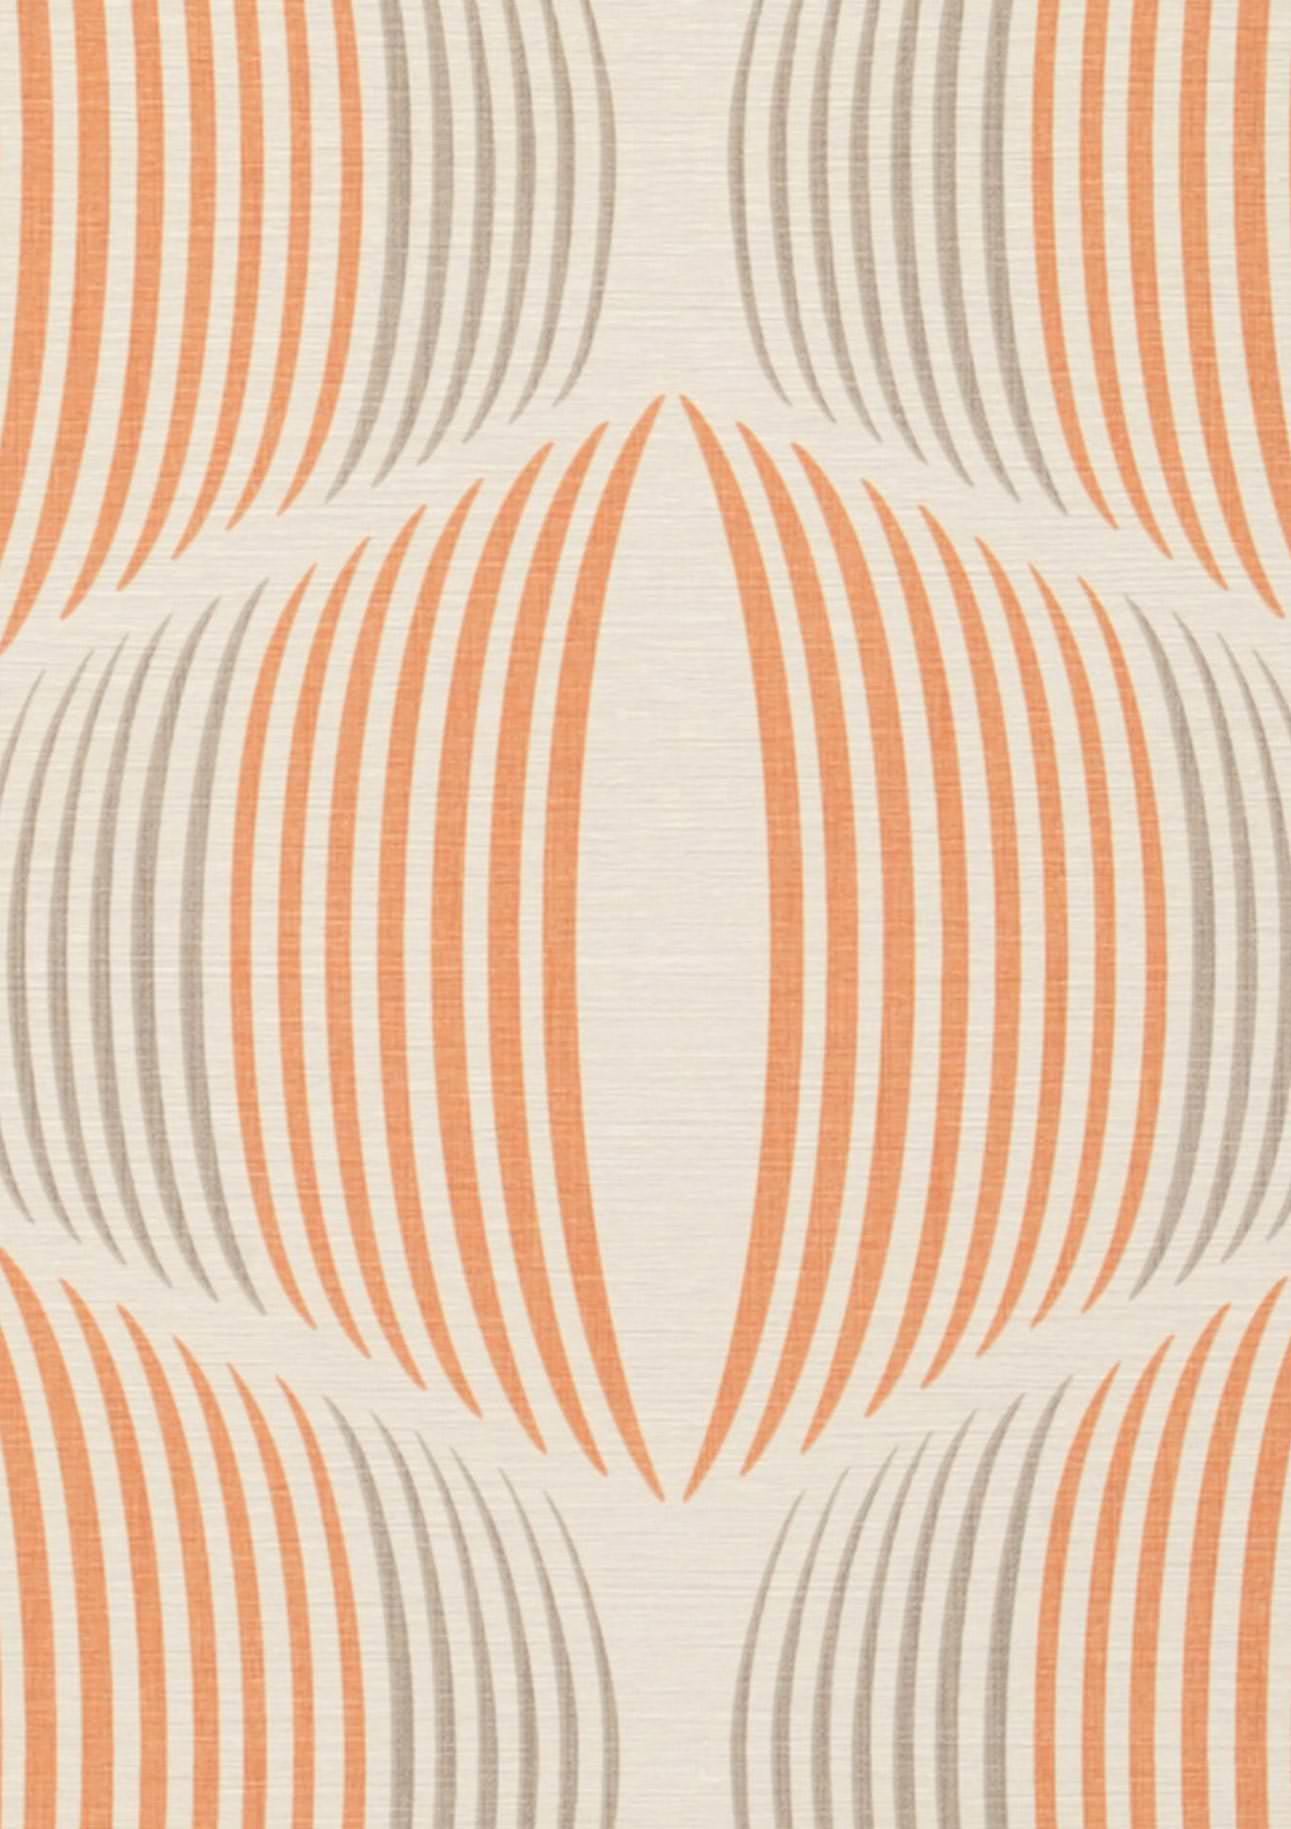 Tapete morena cremeweiss graubeige orange tapeten for Tapete nach hause